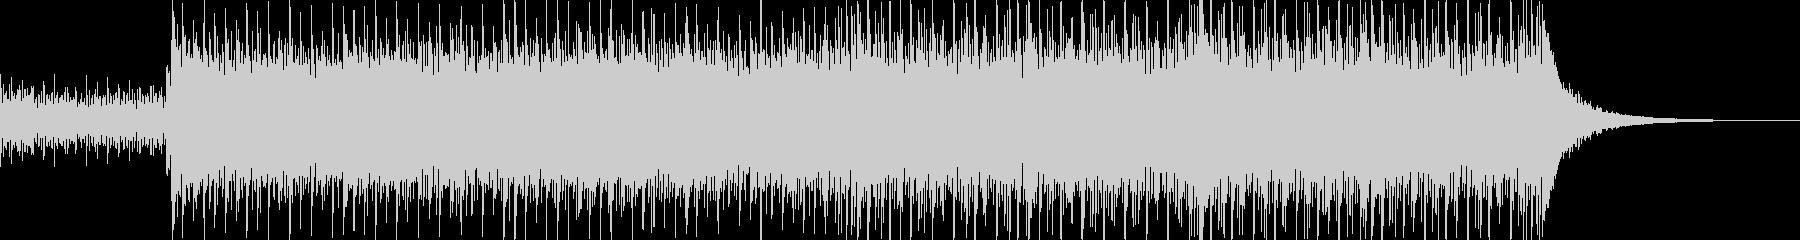 creo_leo_bgm44の未再生の波形